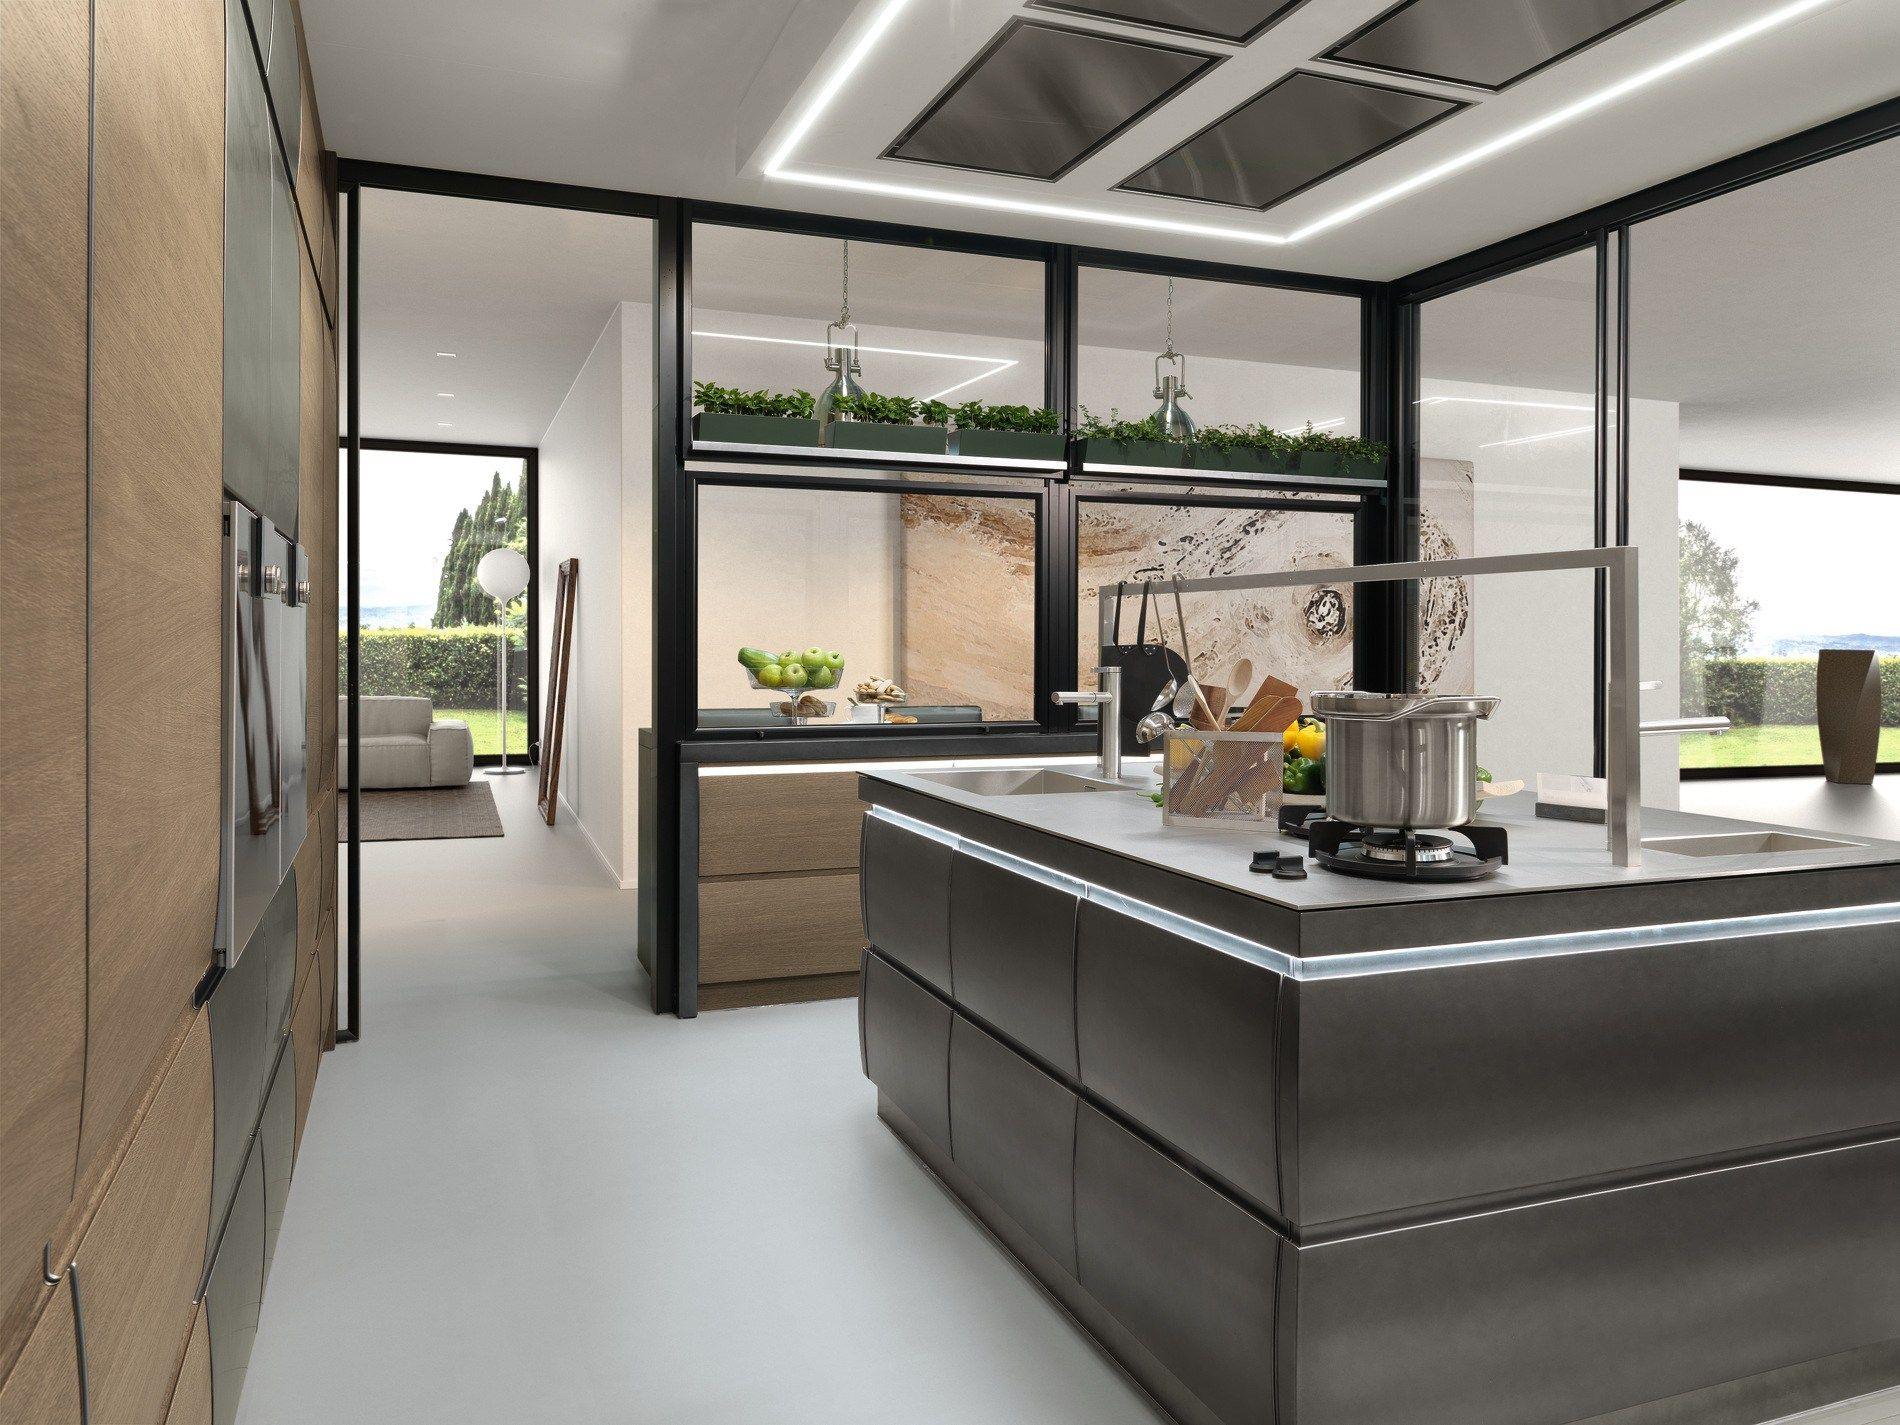 Emejing Cucine L Ottocento Prezzi Images - acrylicgiftware.us ...